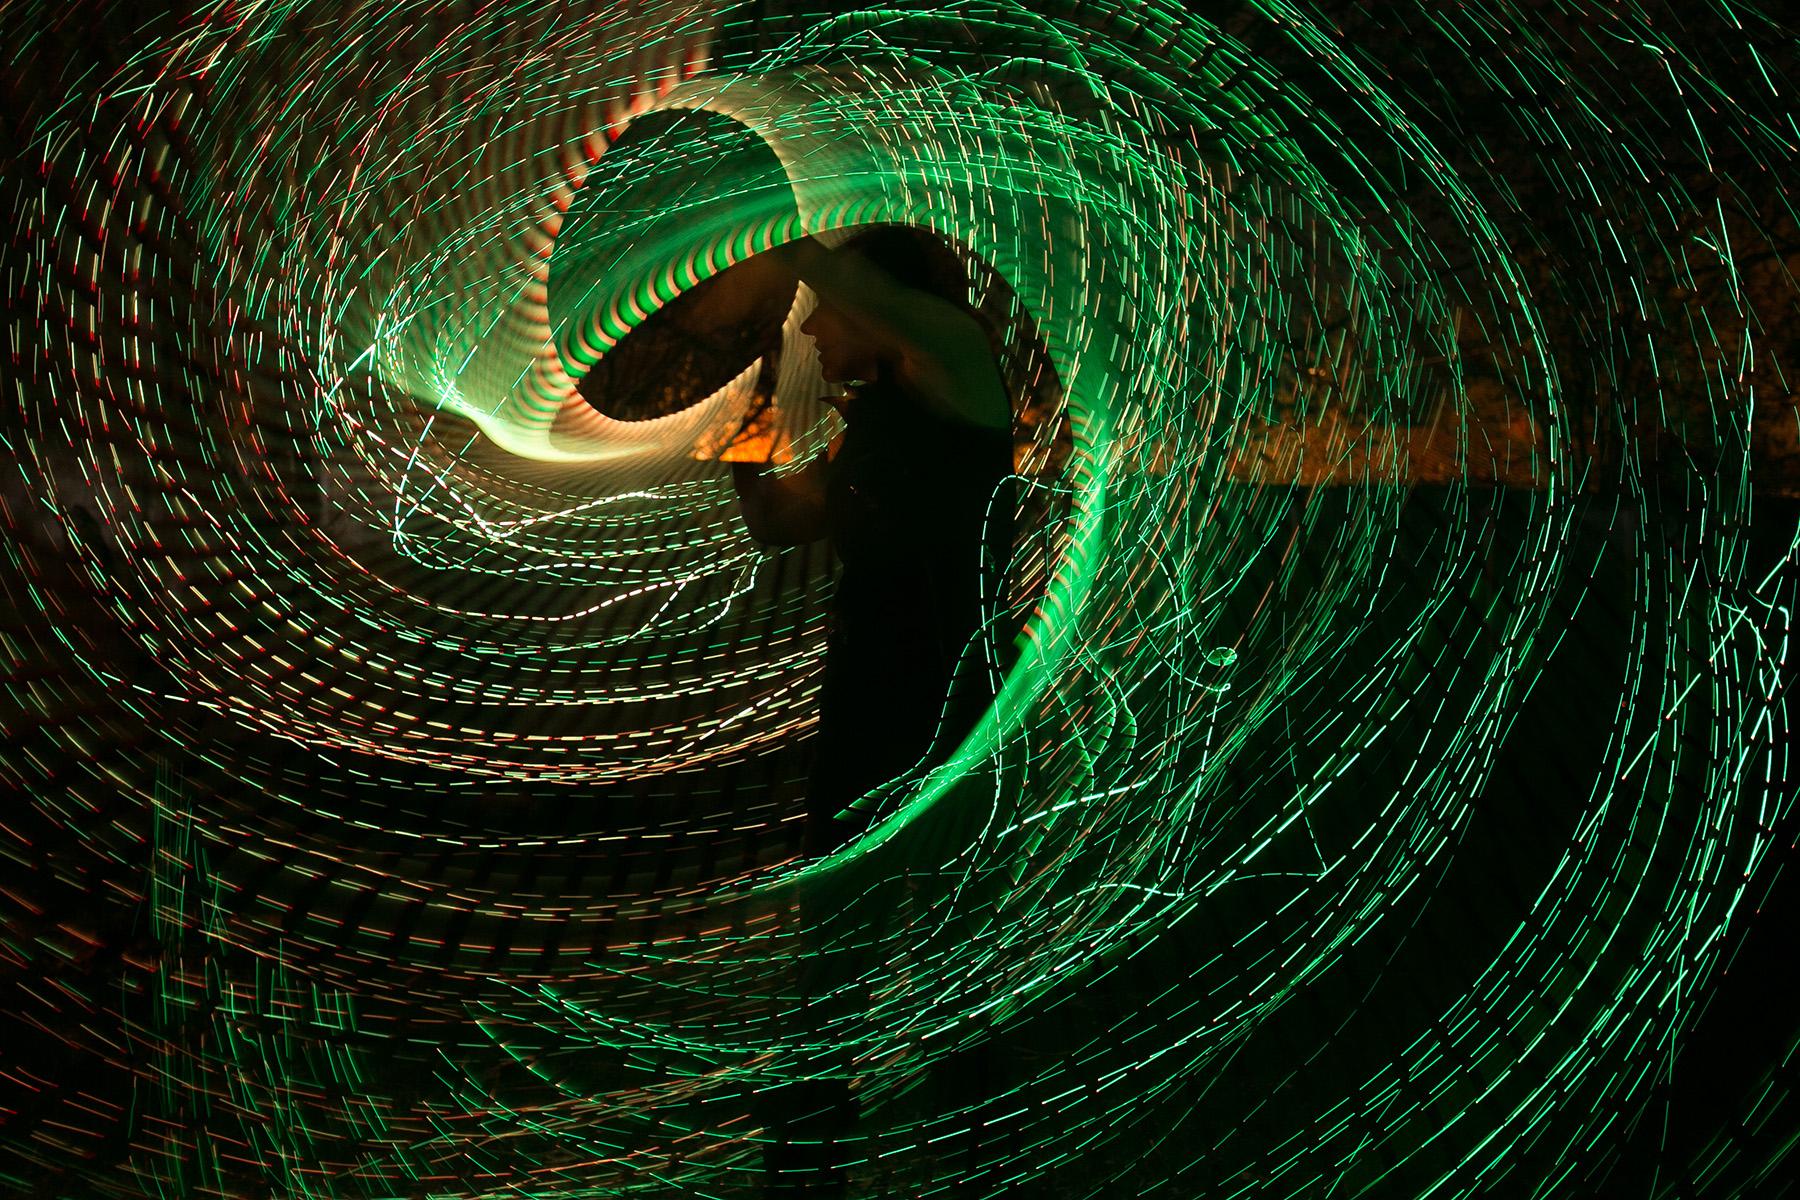 Зелёный вихрь. Анастасия Хромышева